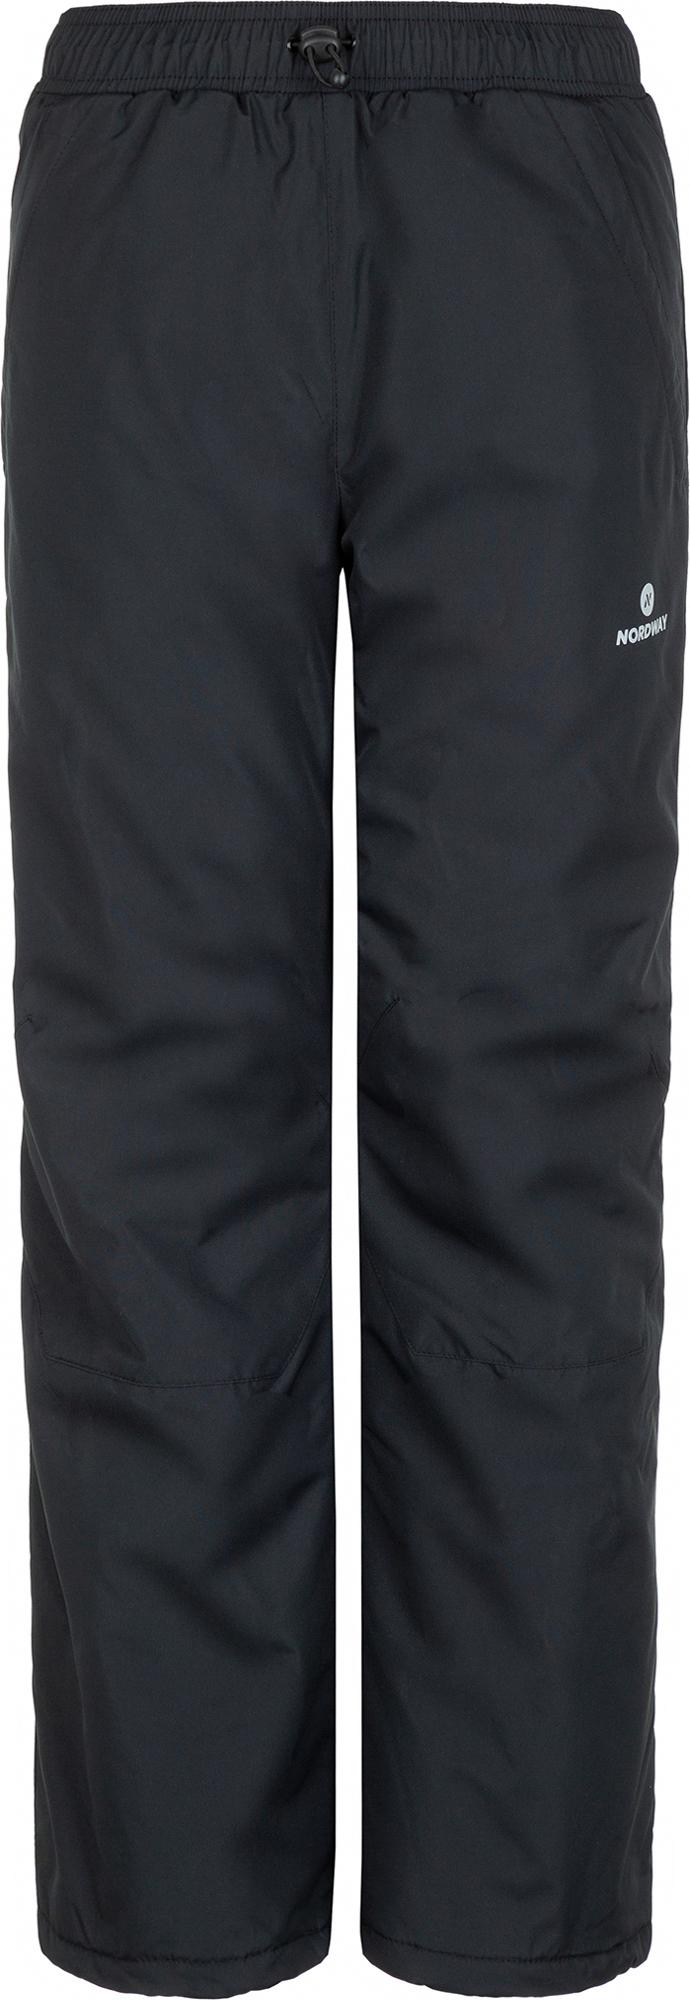 Nordway Брюки для мальчиков Nordway, размер 140 nordway куртка утепленная мужская nordway размер 46